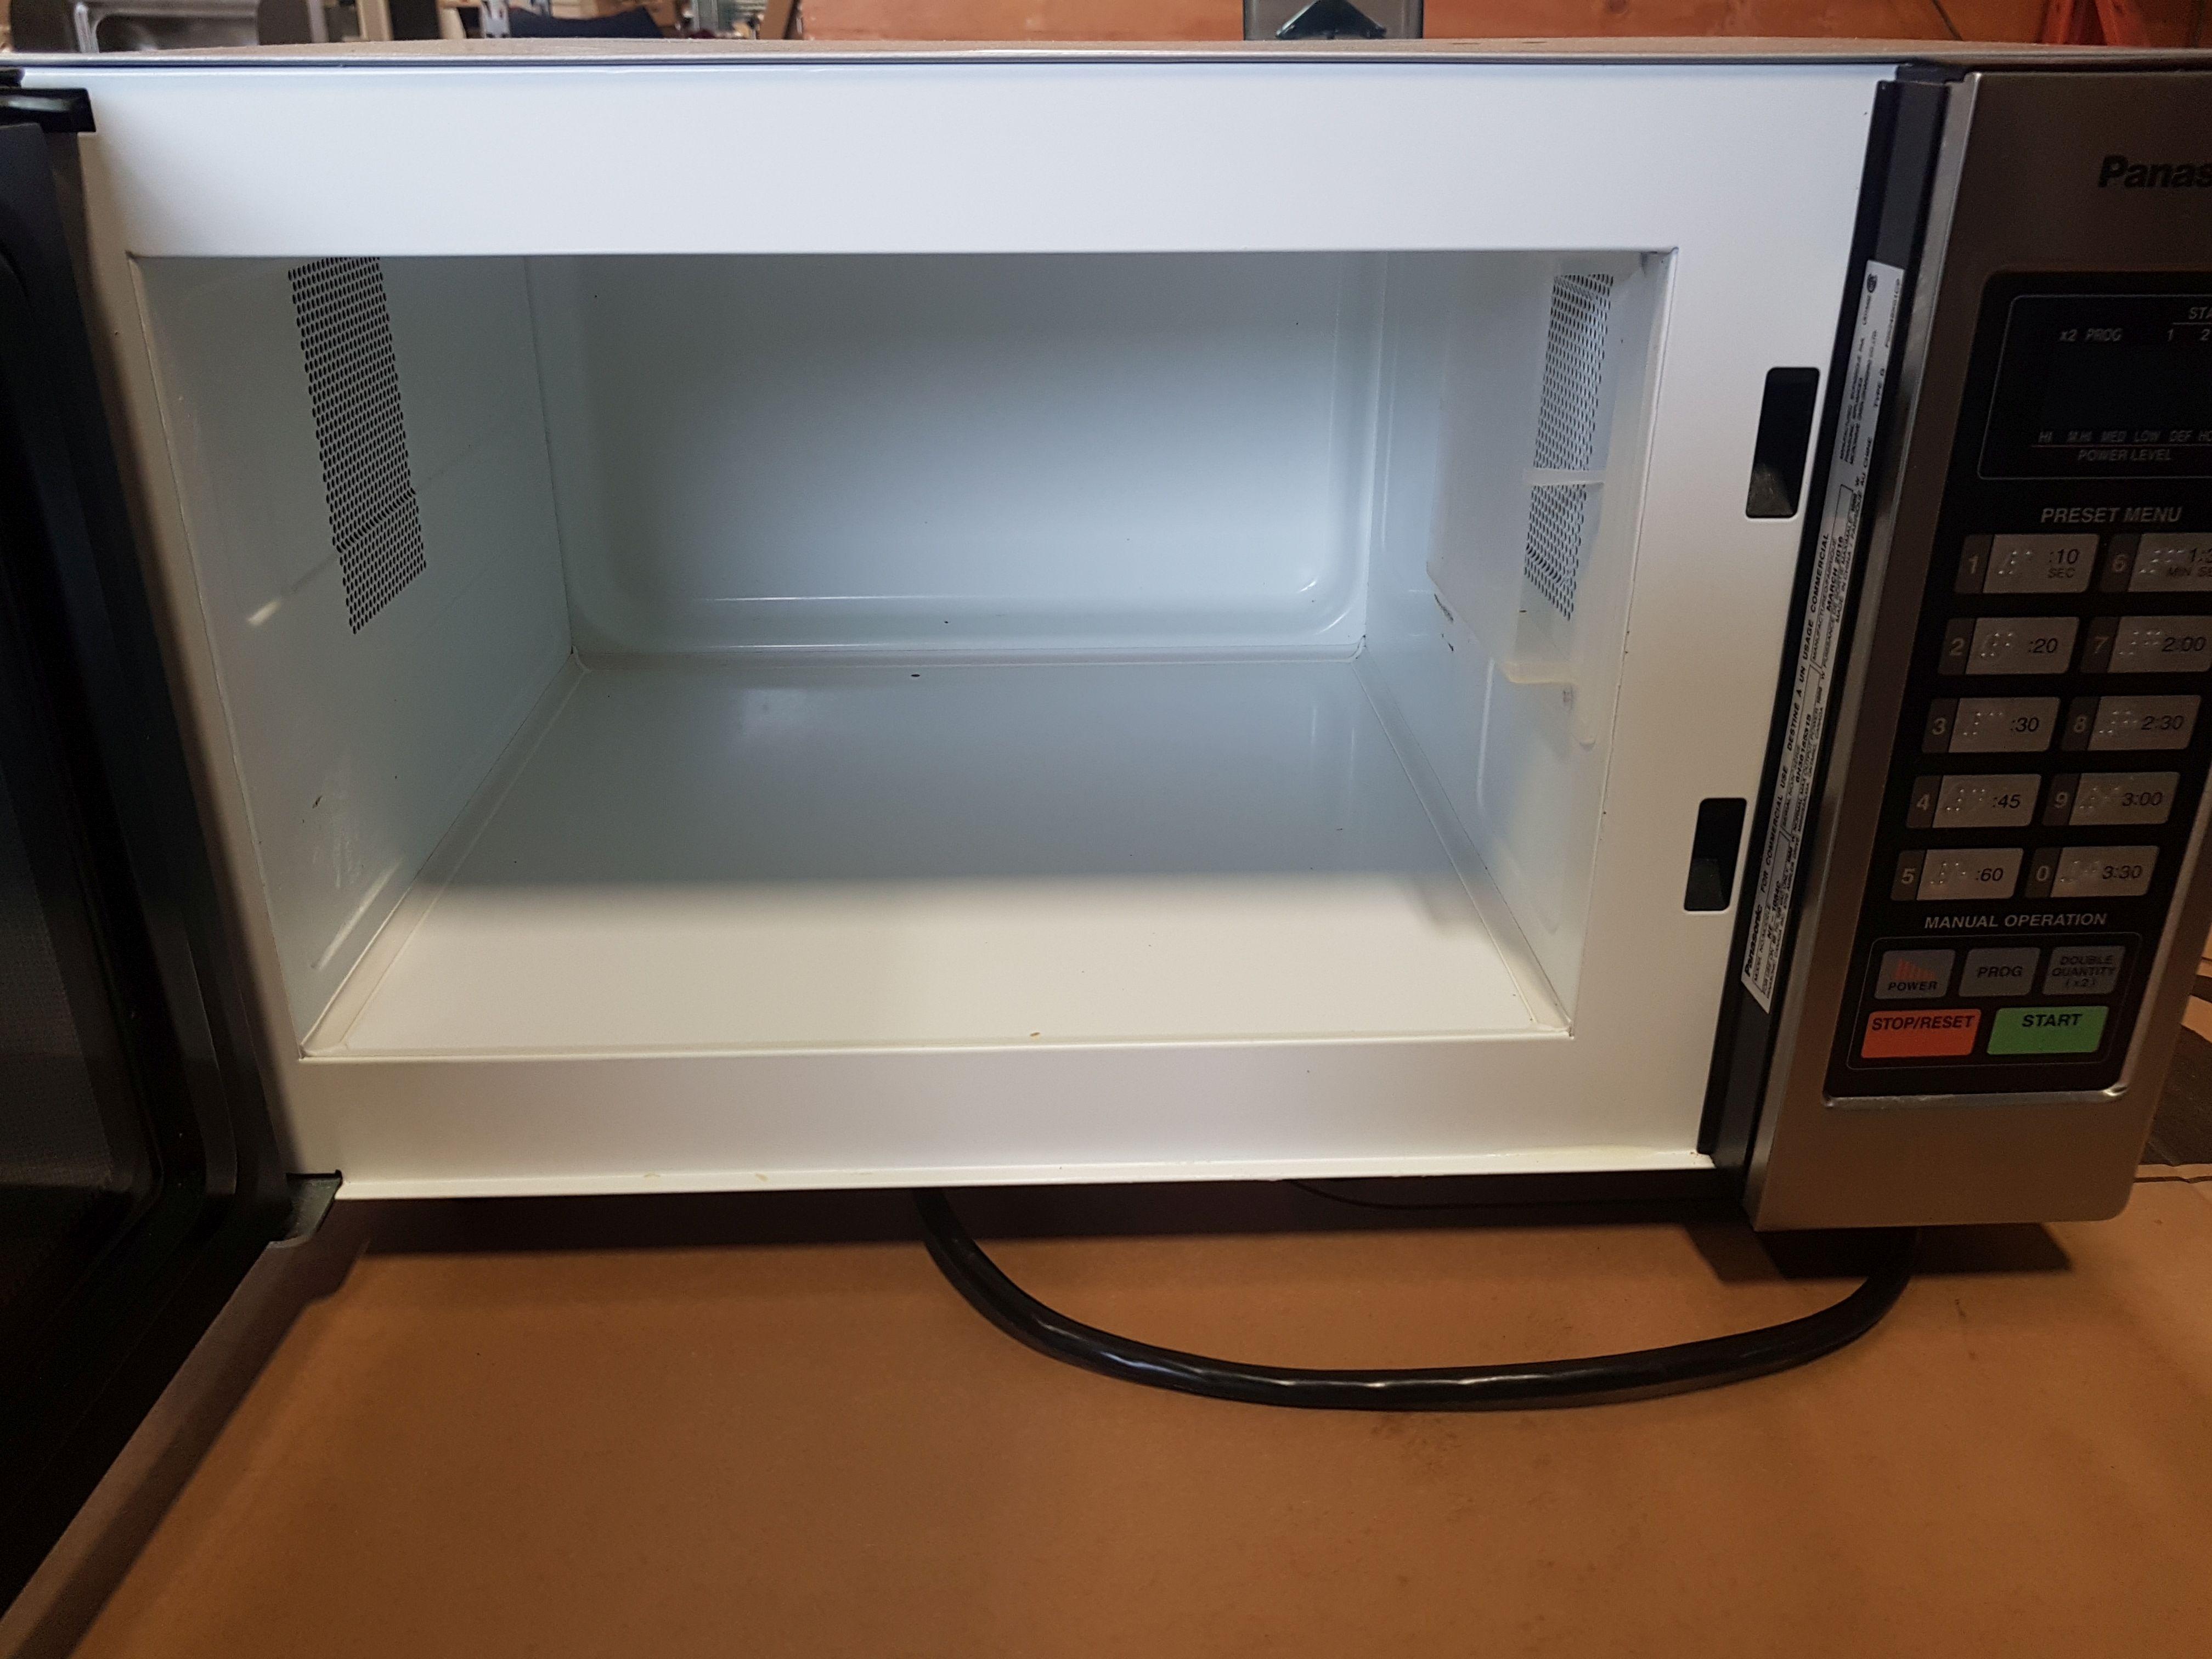 Lot 27 - Panasonic Microwave -Model NE-1054C